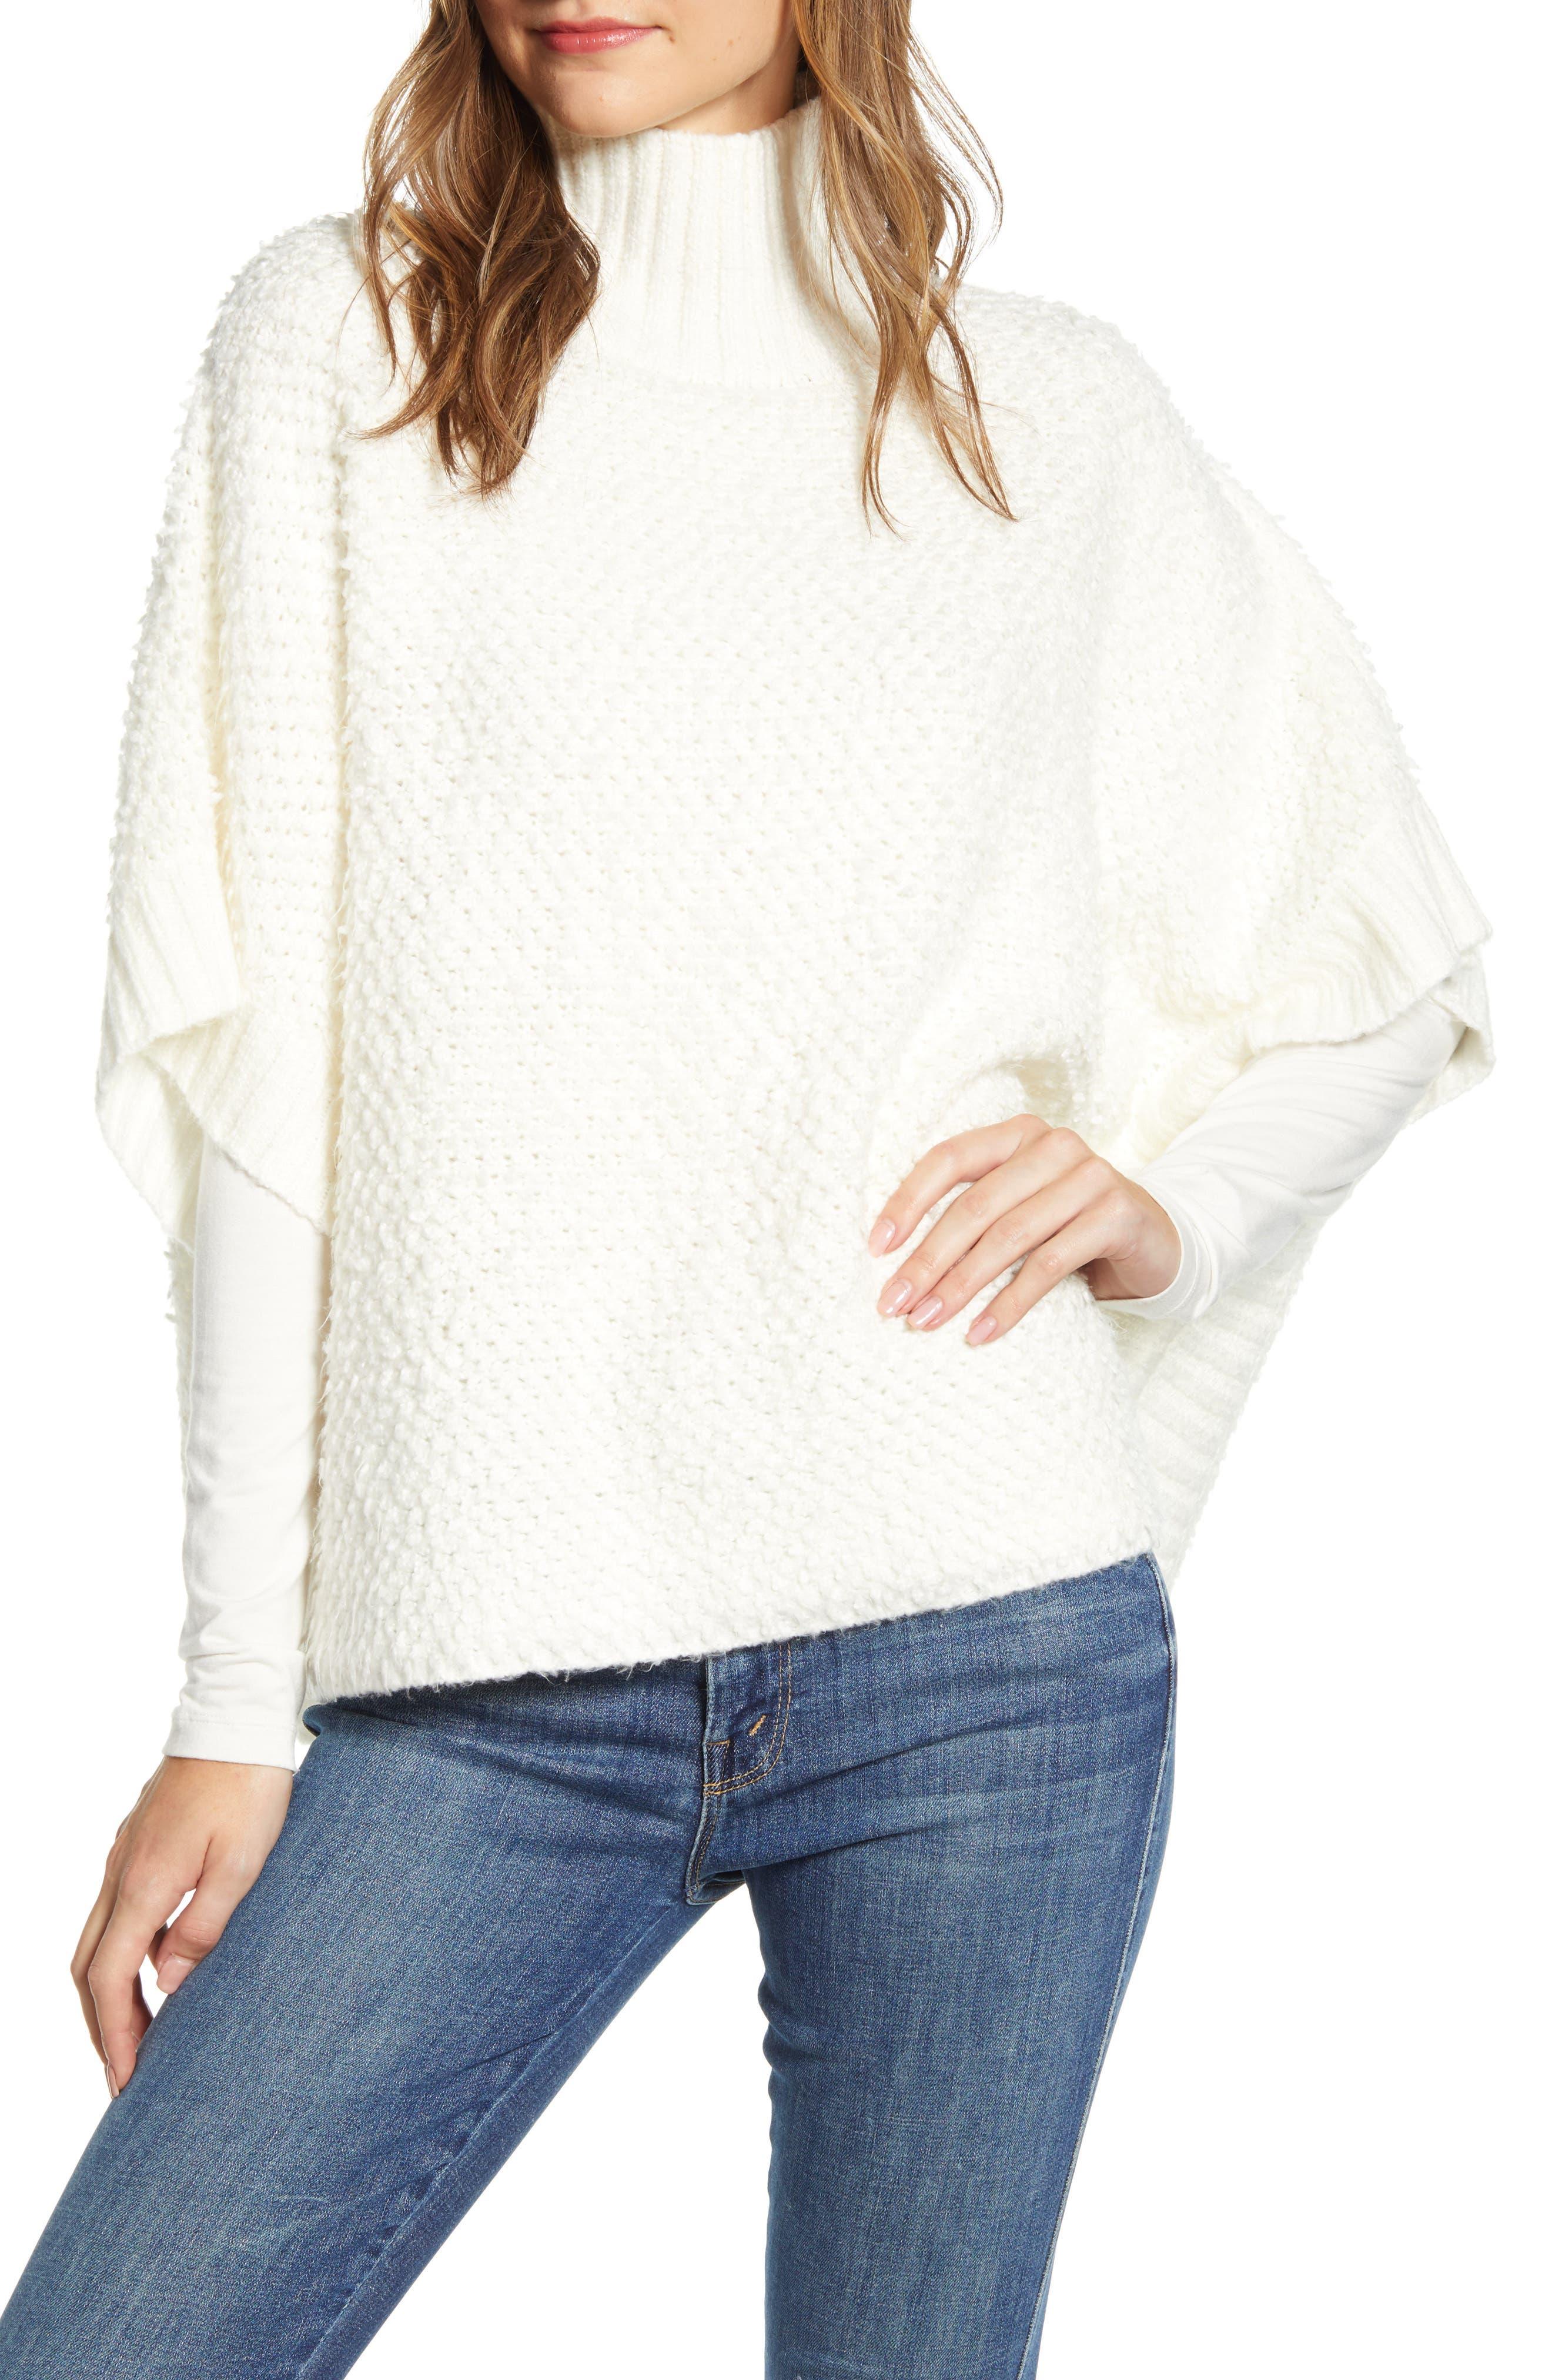 Lou & Grey Loopstitch Funnel Neck Poncho Sweater